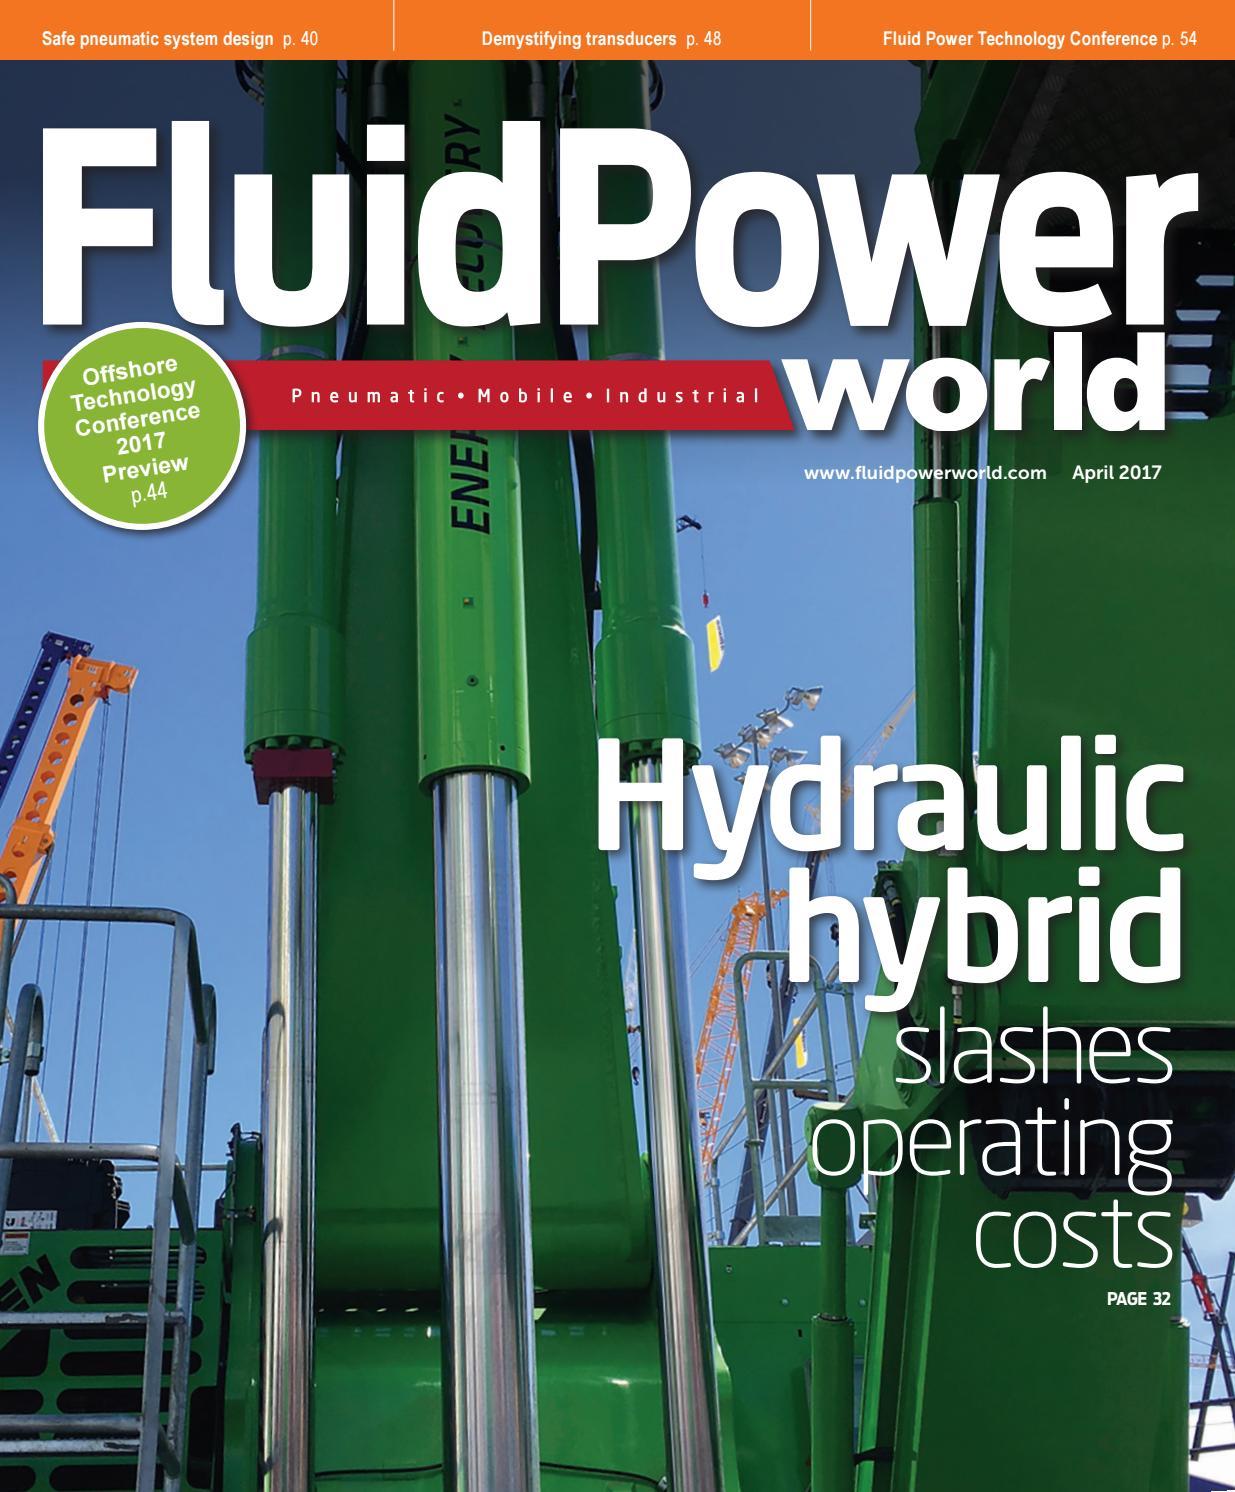 Fluid Power World April 2017 By Wtwh Media Llc Issuu Elprocus 39s Electrical Engineering Blog Eeweb Community